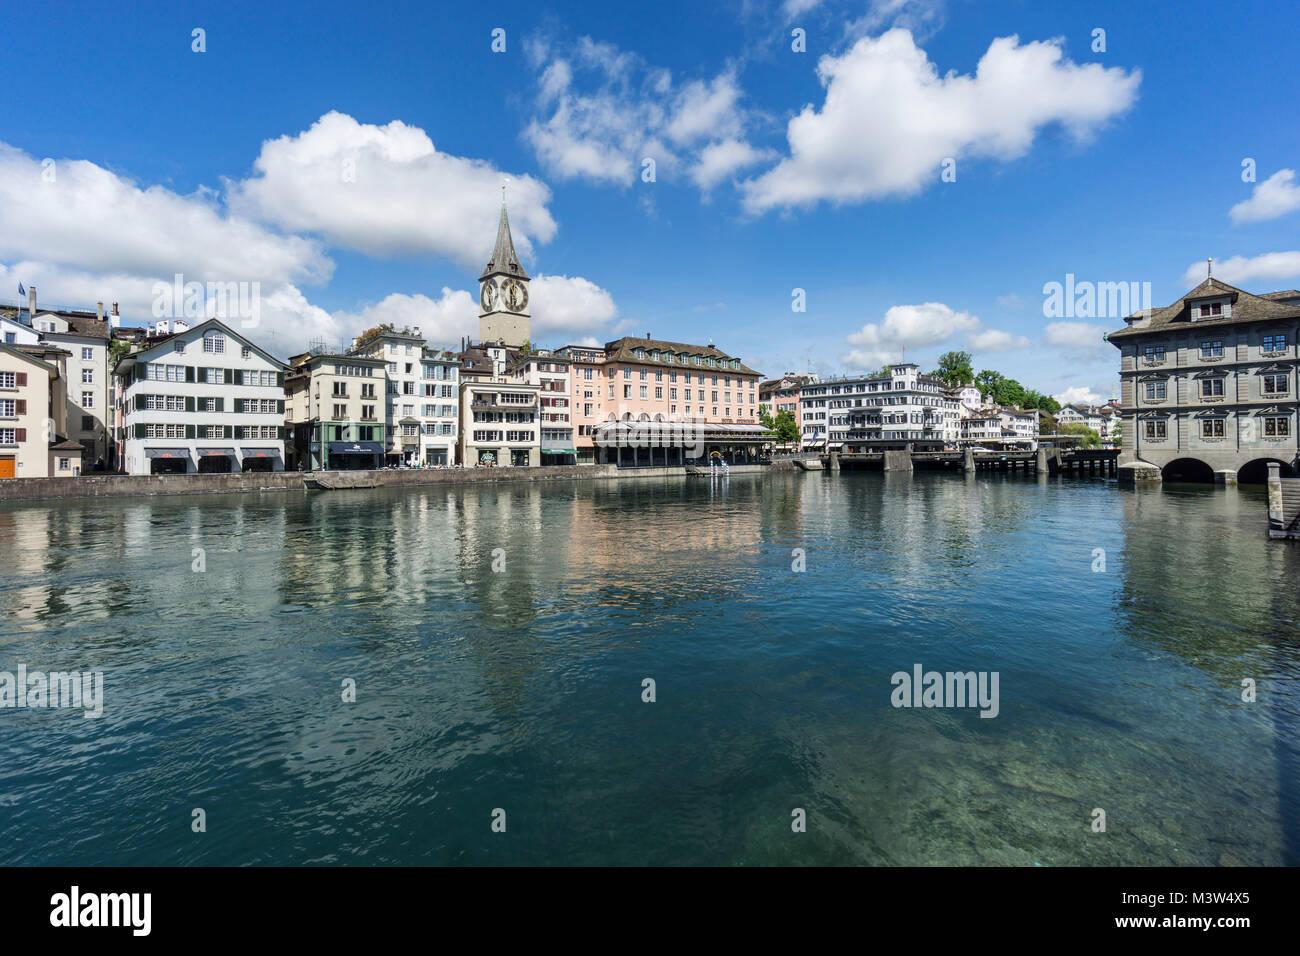 Limmat,  St. Peterskirche, Zürich, Schweiz  | river Limmat, St. Peters church, cityscape Zurich, switzerland - Stock Image